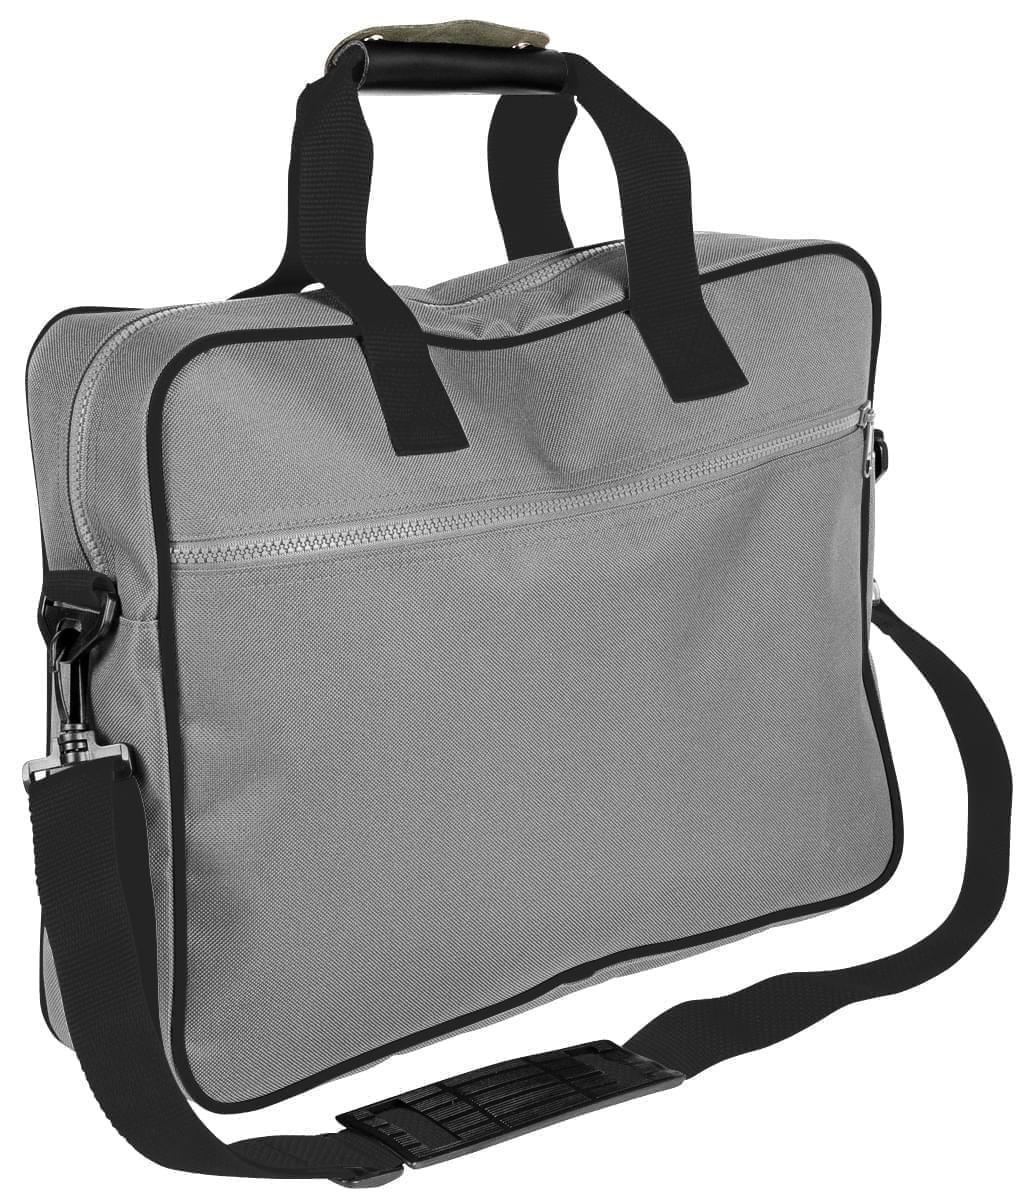 USA Made Nylon Poly Notebook Sleeves, Grey-Black, CPKVA59P1R